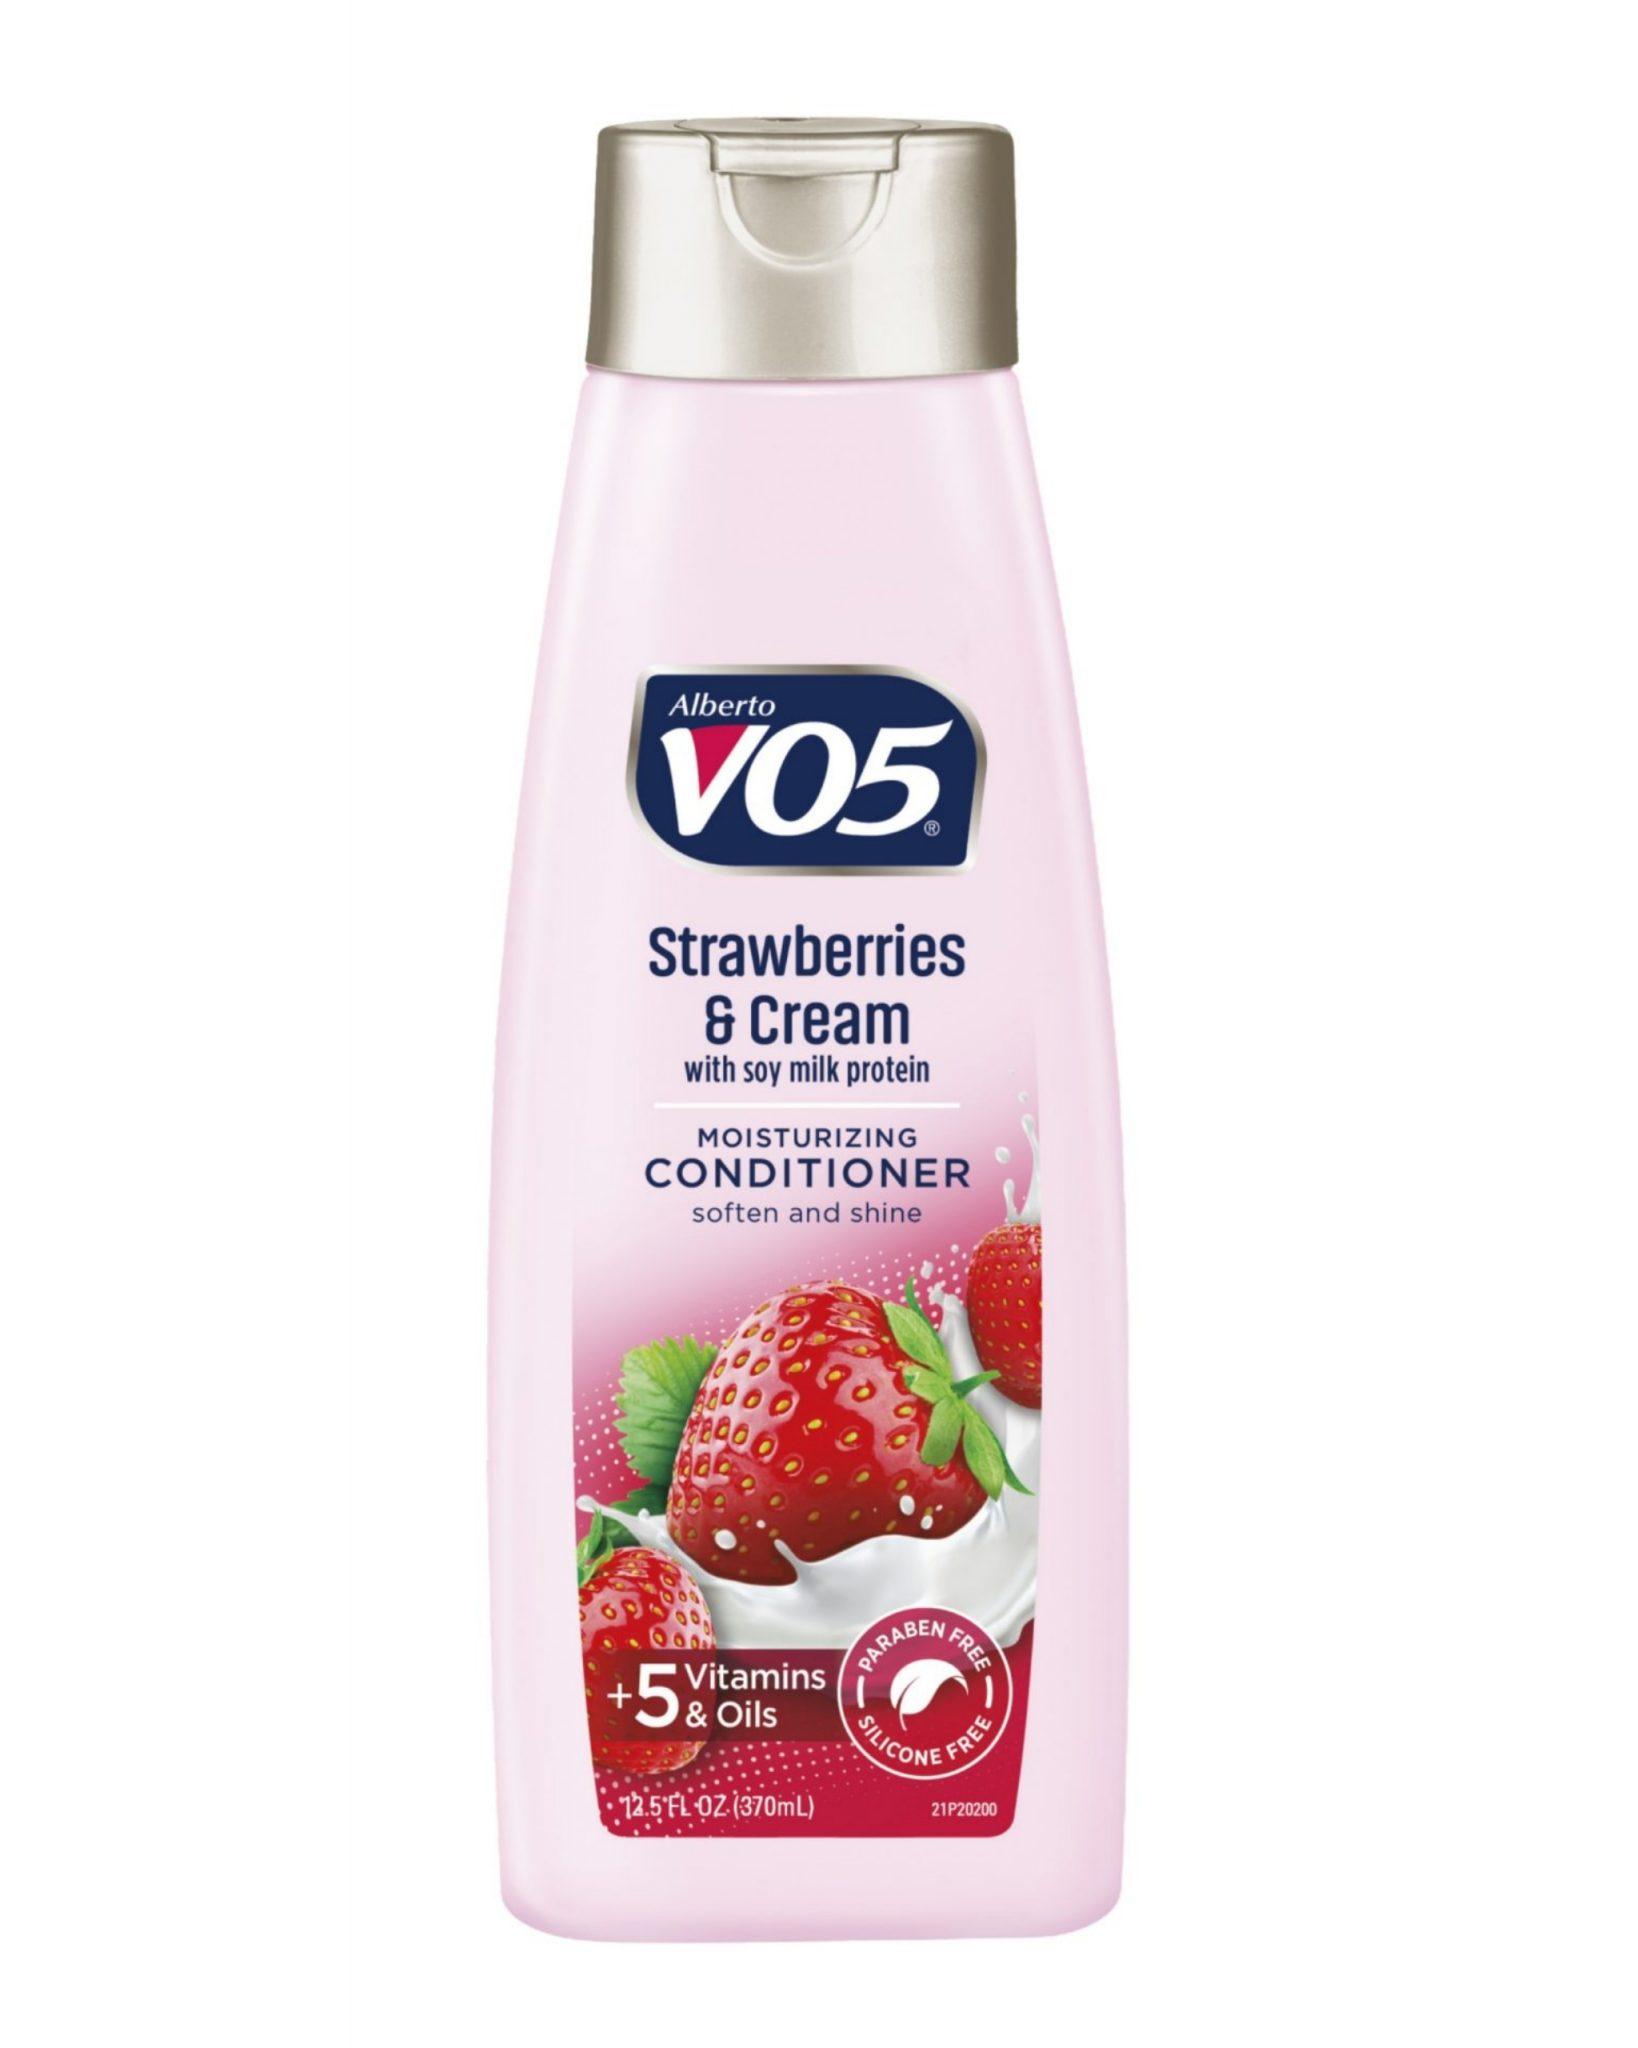 Alberto VO5 Strawberries & Cream Moisturizing Conditioner 12.5 fl oz